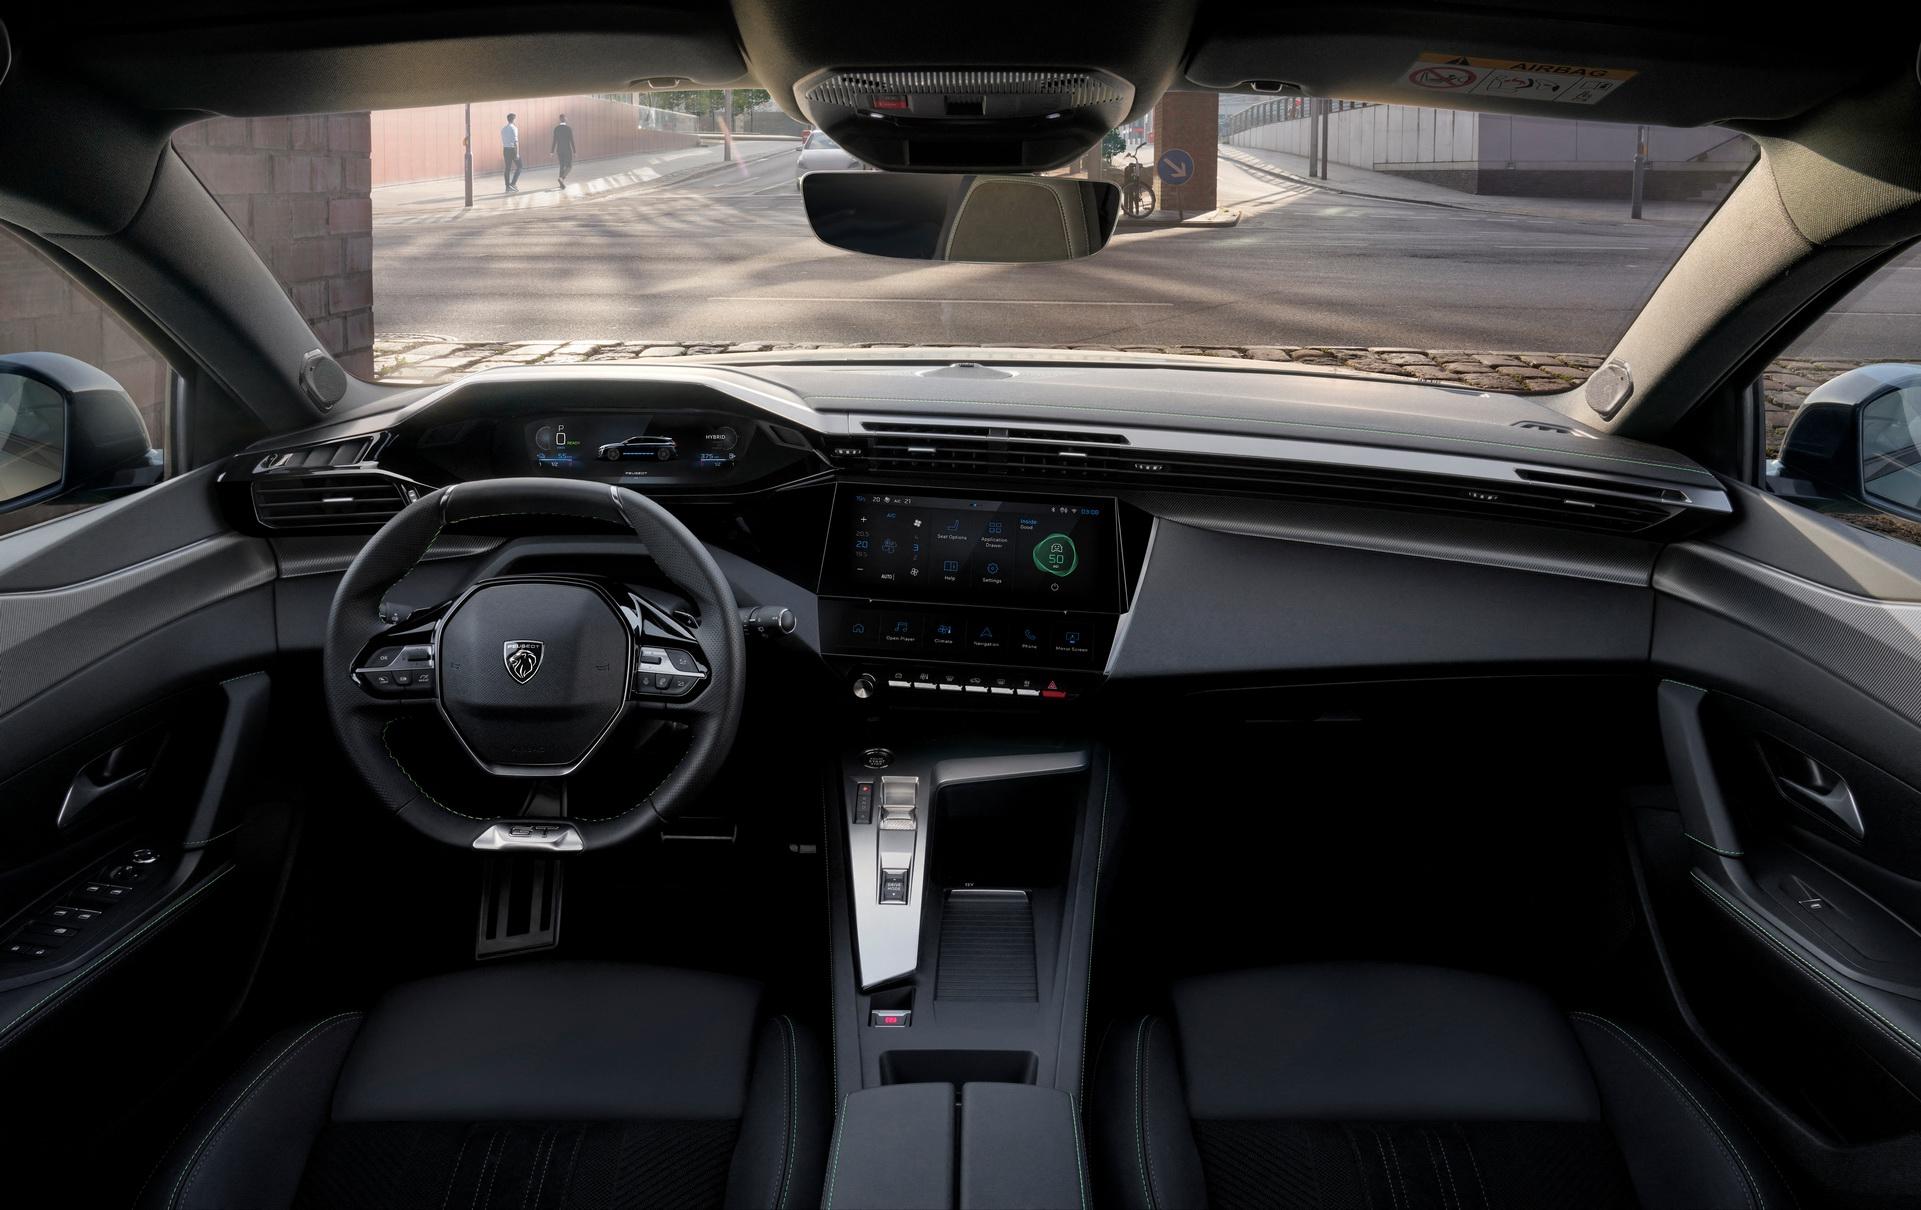 Peugeot 308 Sw 2022 (21)